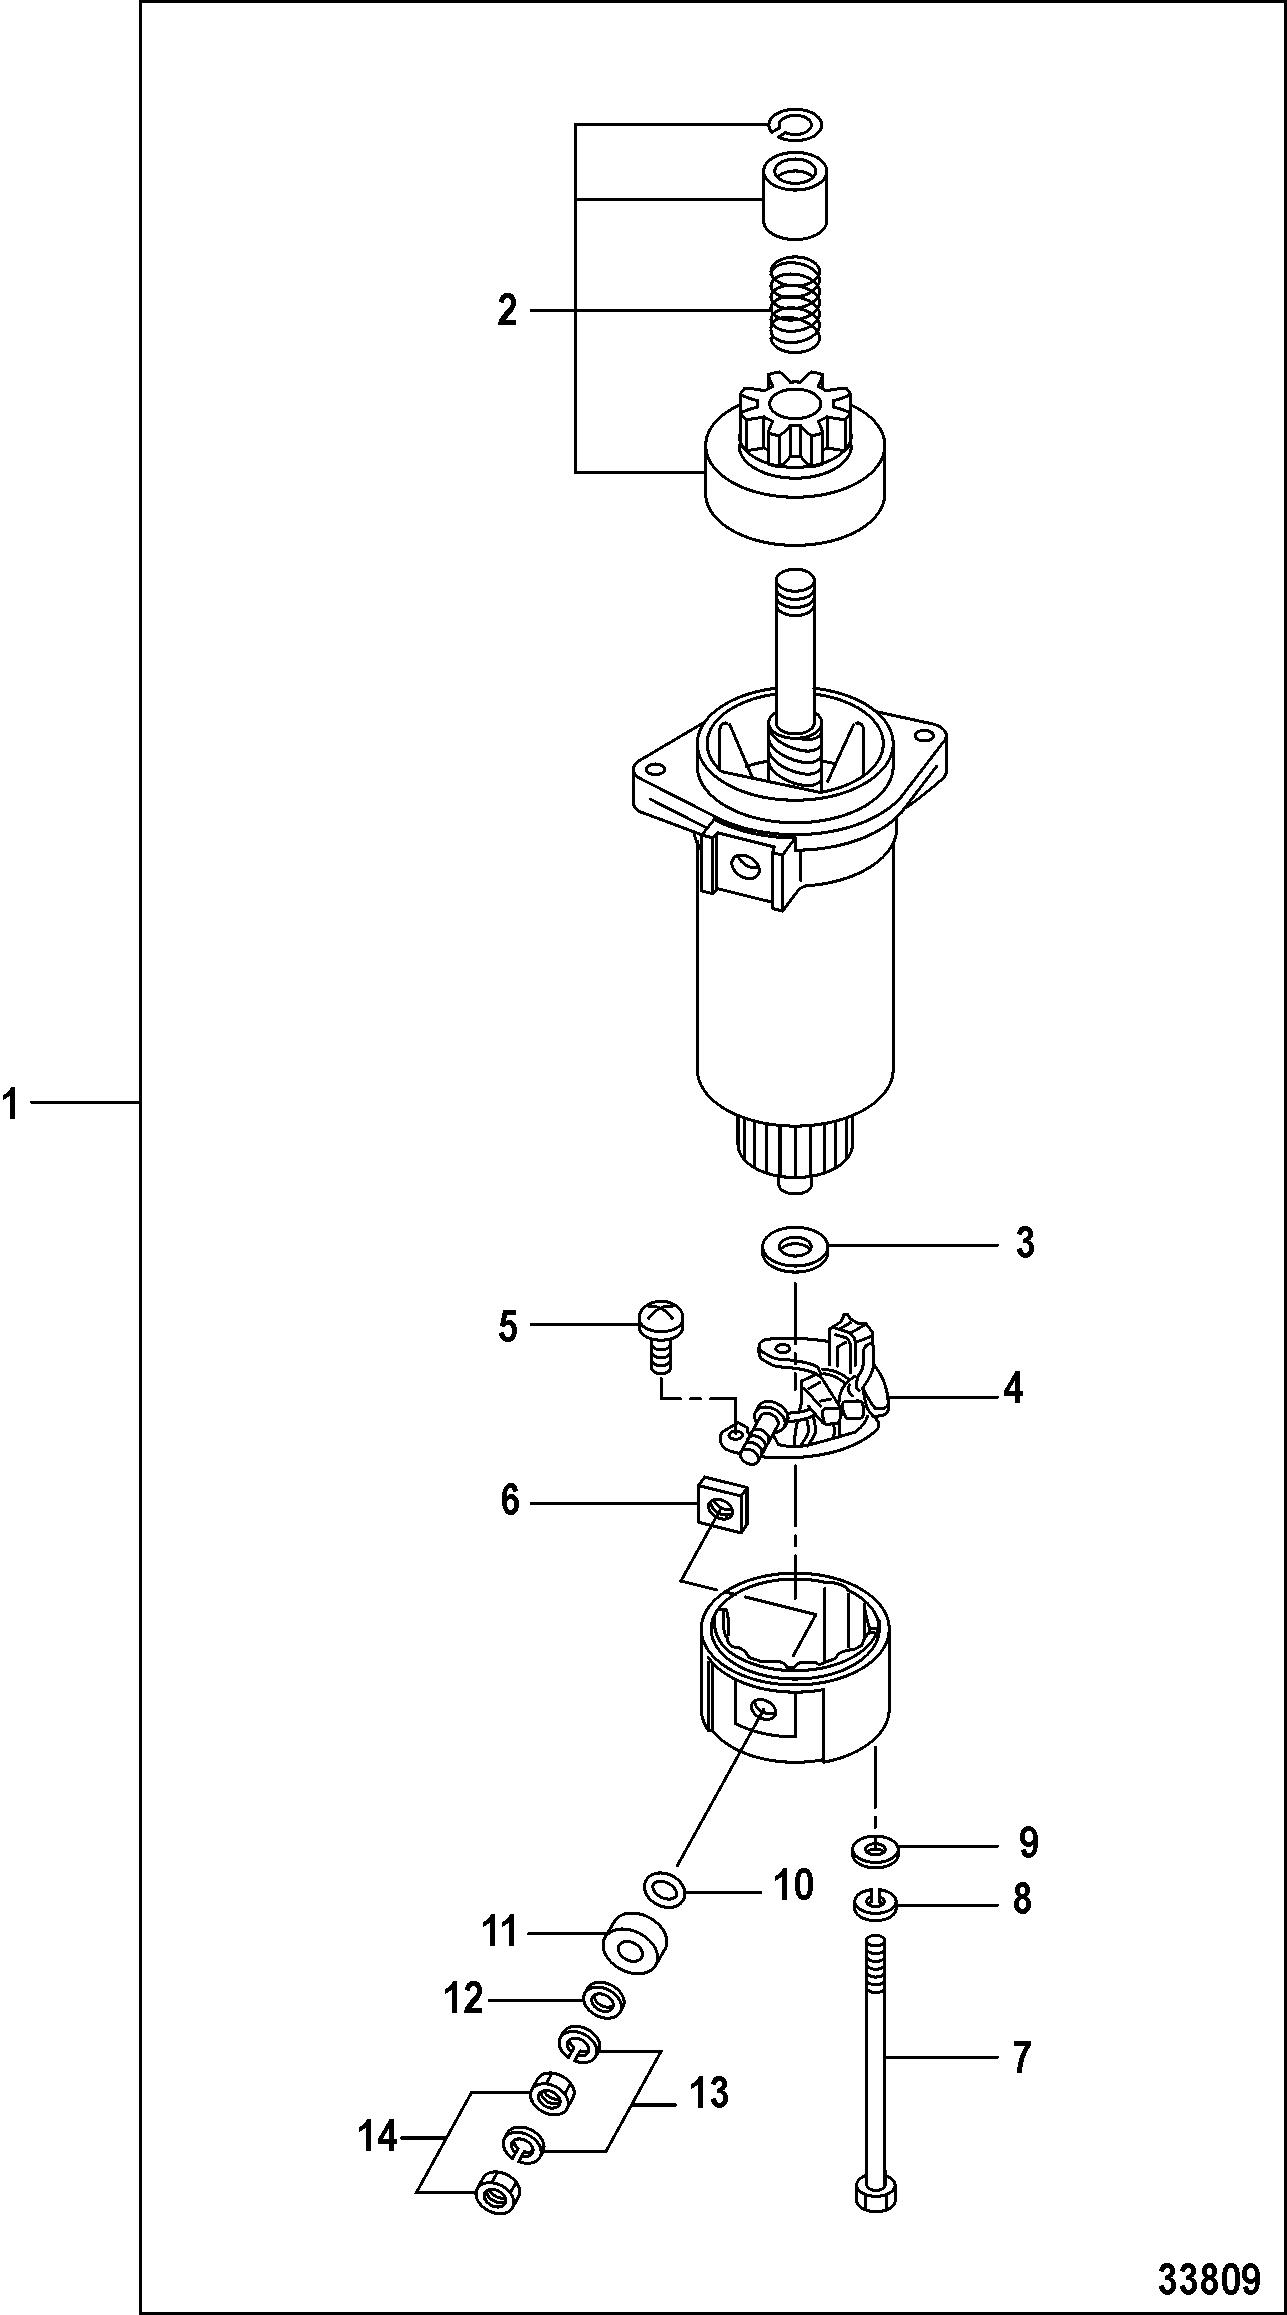 Каталог запчастей mariner 20 carb(2cyl)(4 stroke) 0r235168 \u0026 upstarter motor components